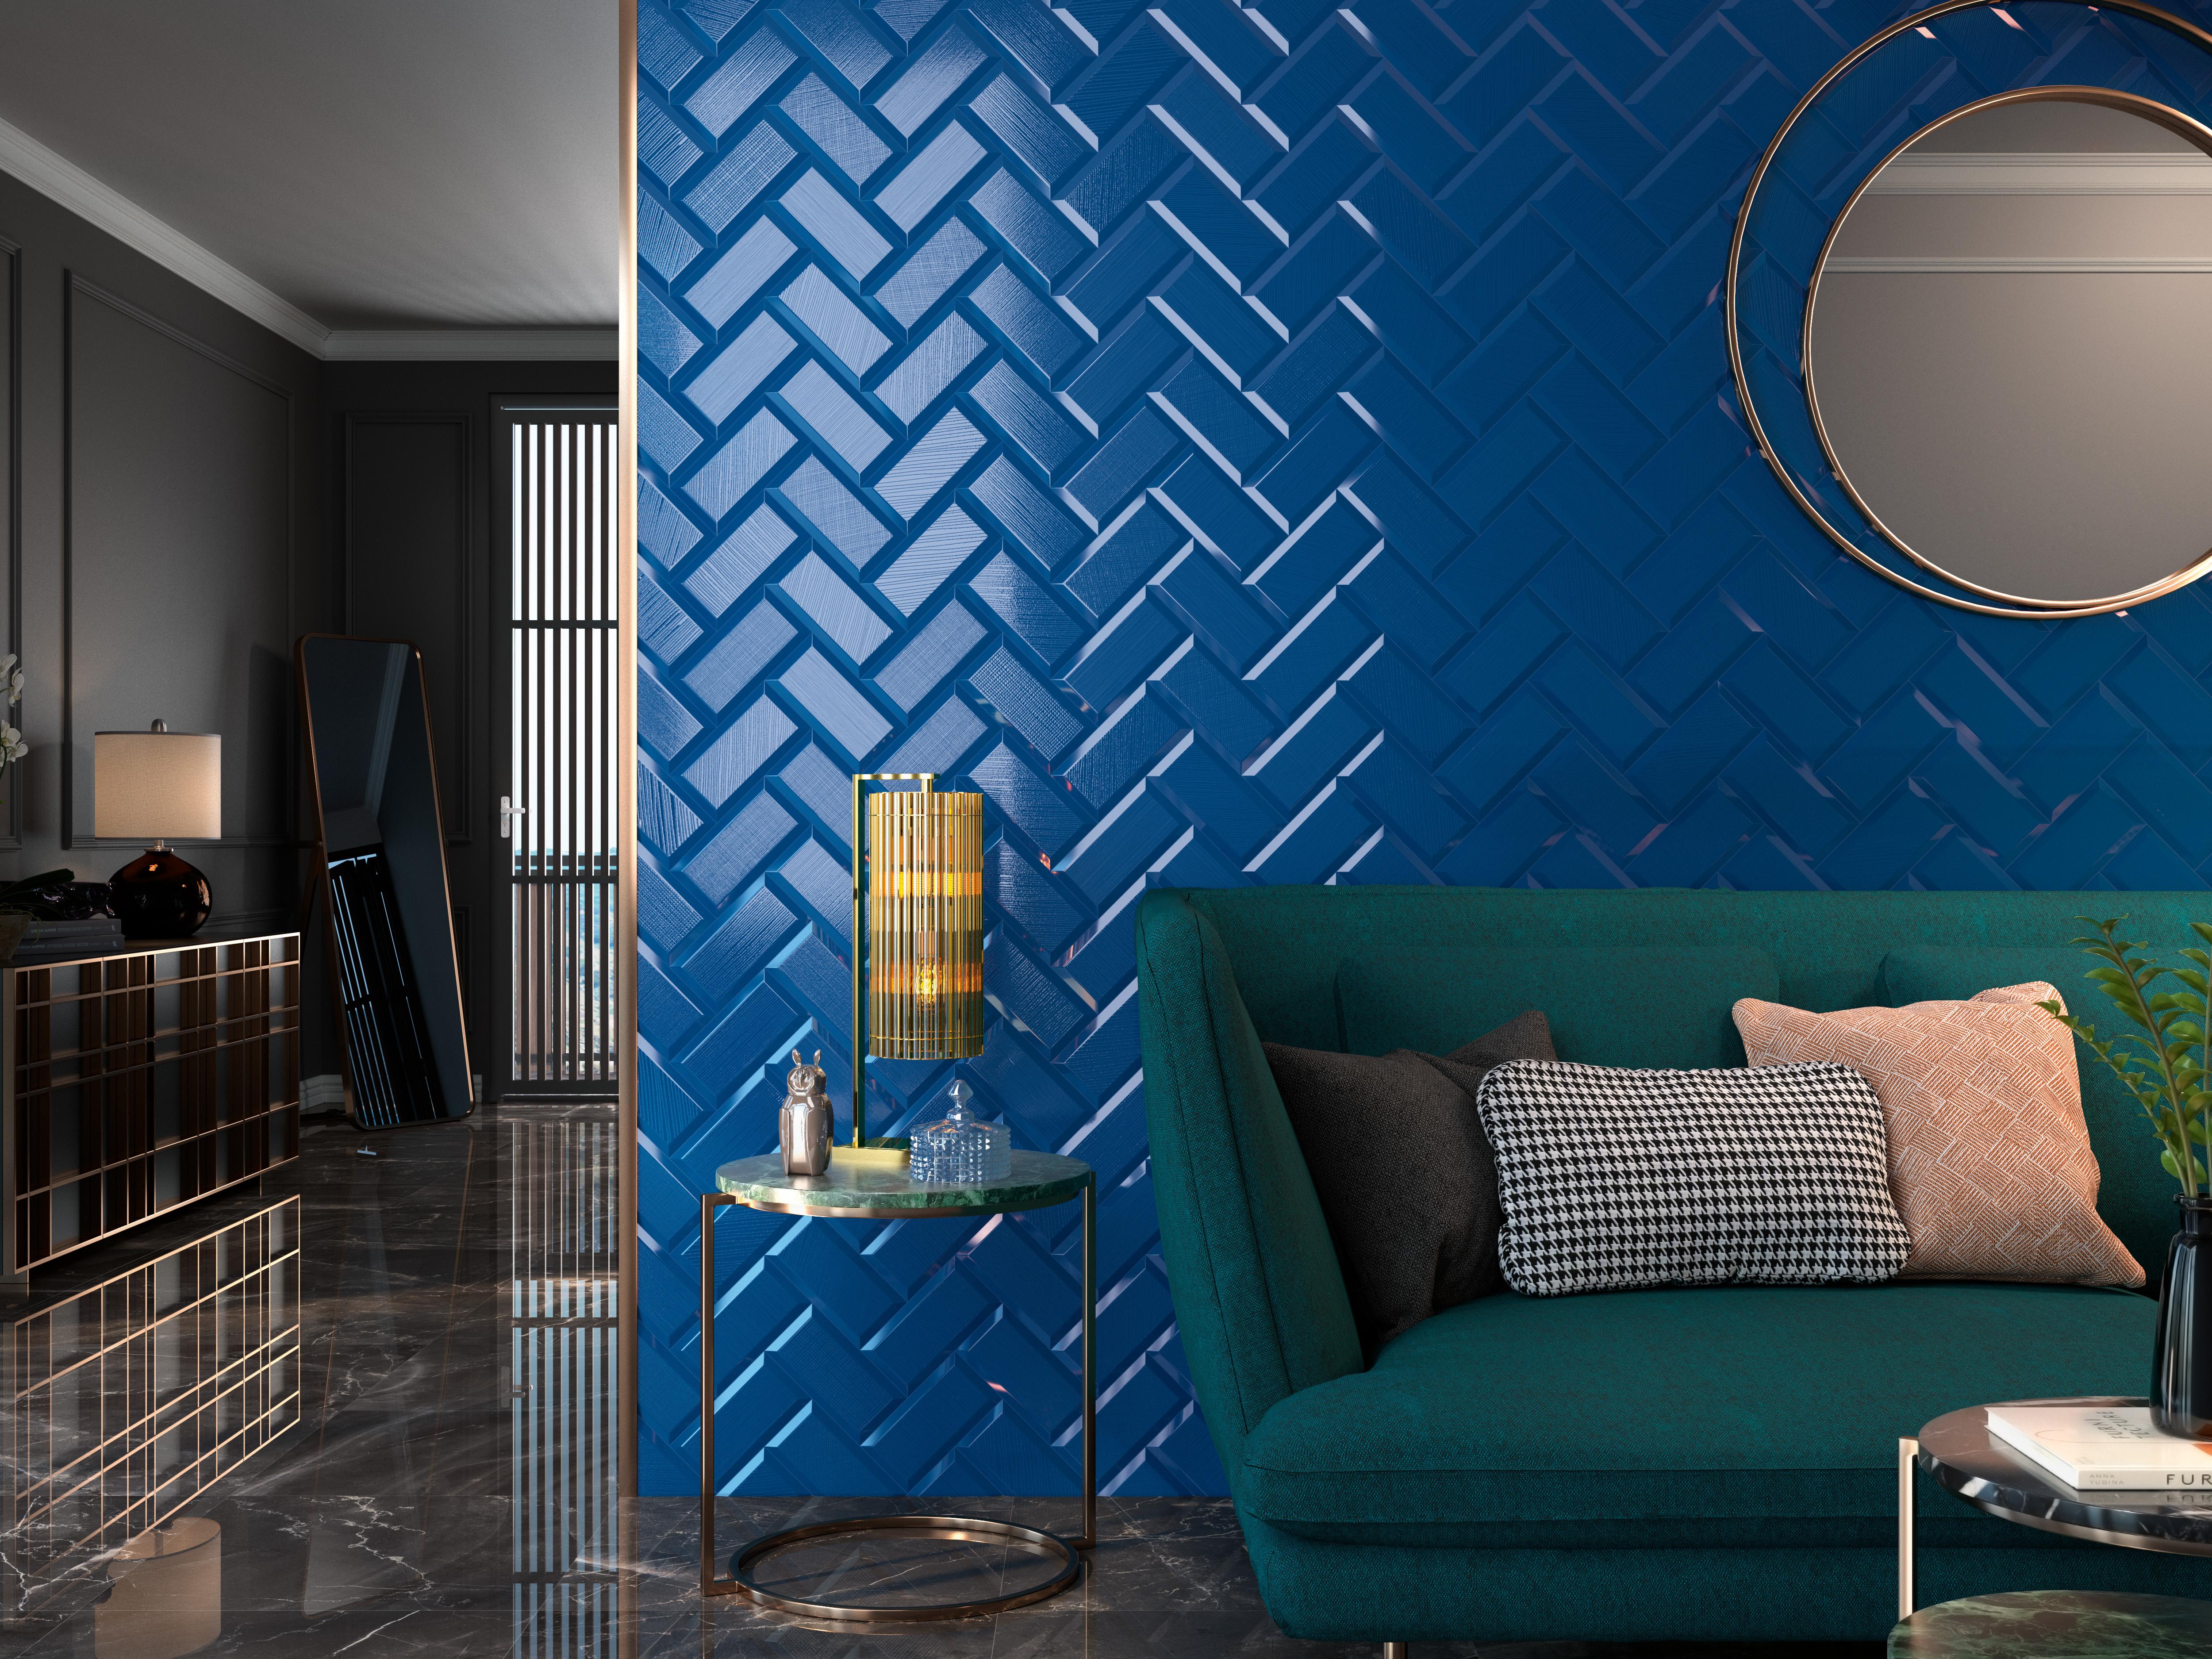 Boulevard-new-navy-accent-wall-miami-kitchen-bath-decor ...